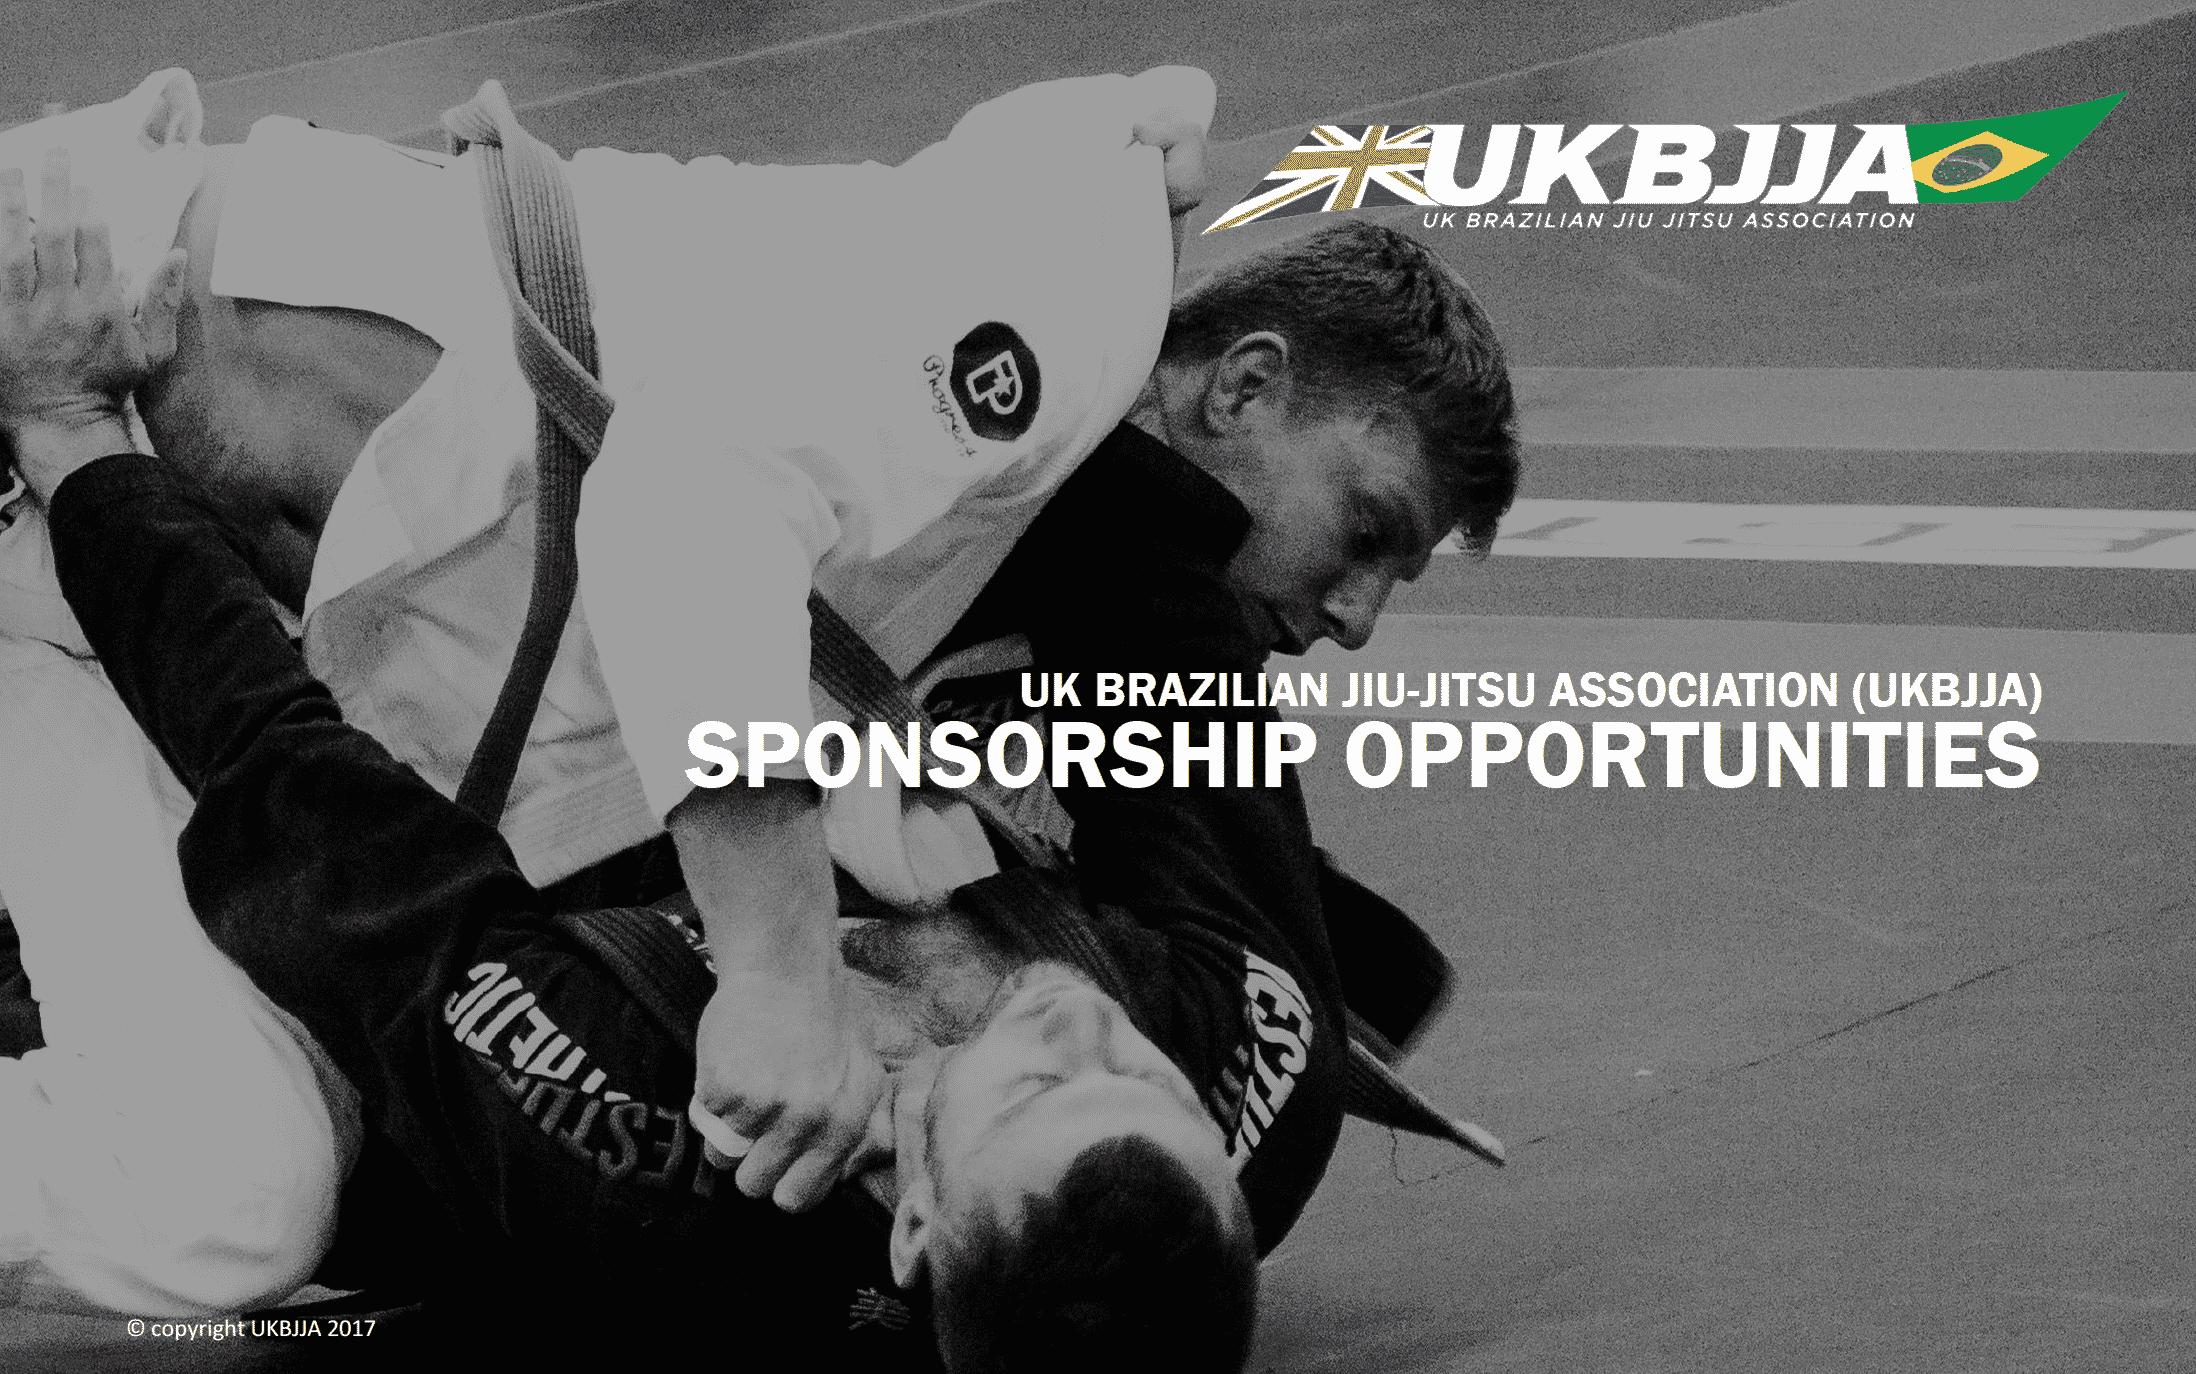 Image of UKBJJA Sponsorship Pack for download